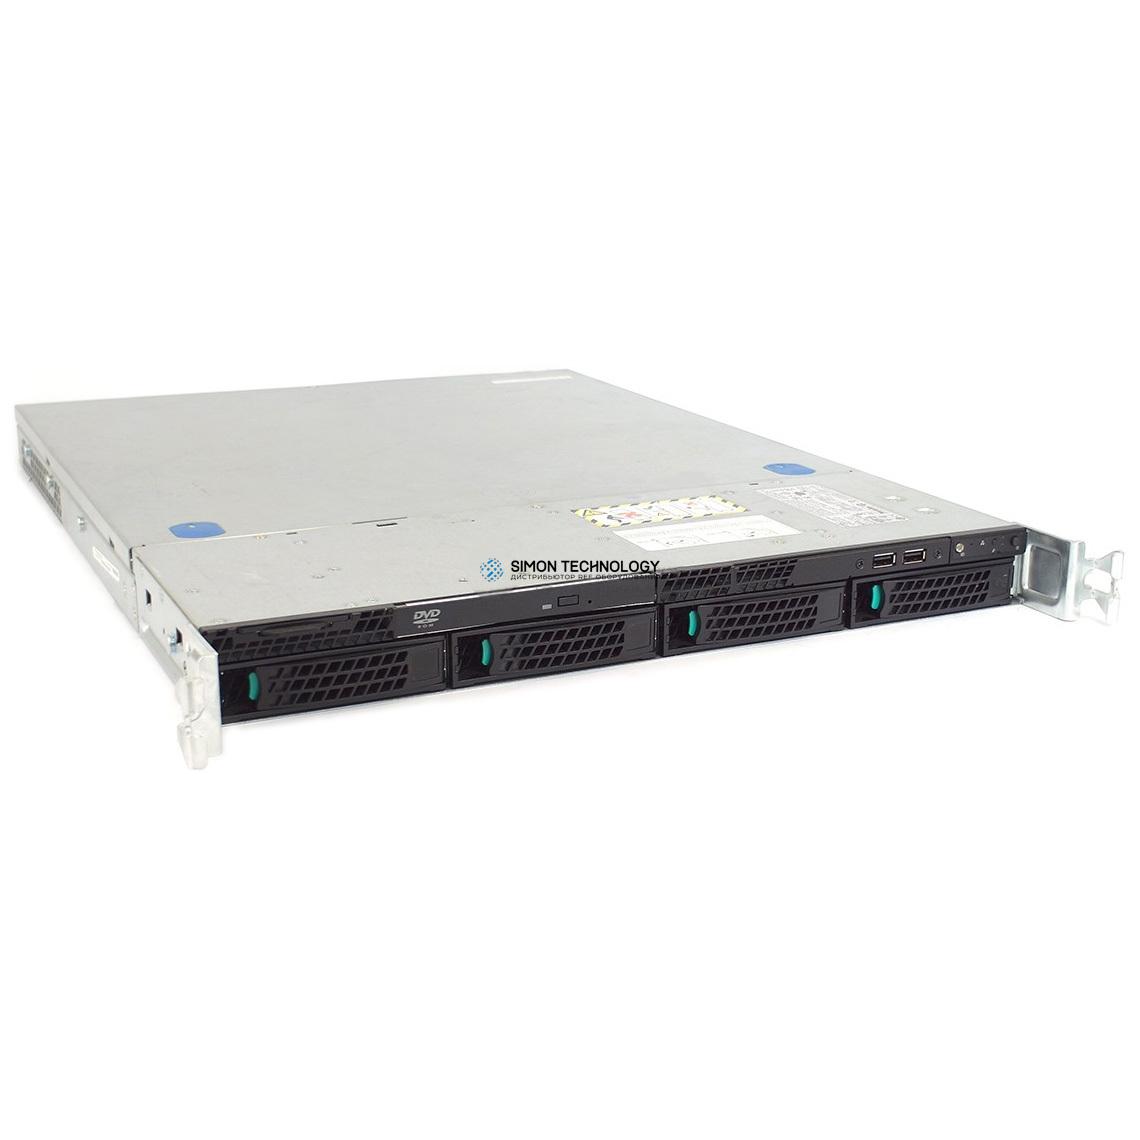 Сервер EMC EMC VNX52/VN54/5600 Control St on (100-520-152)